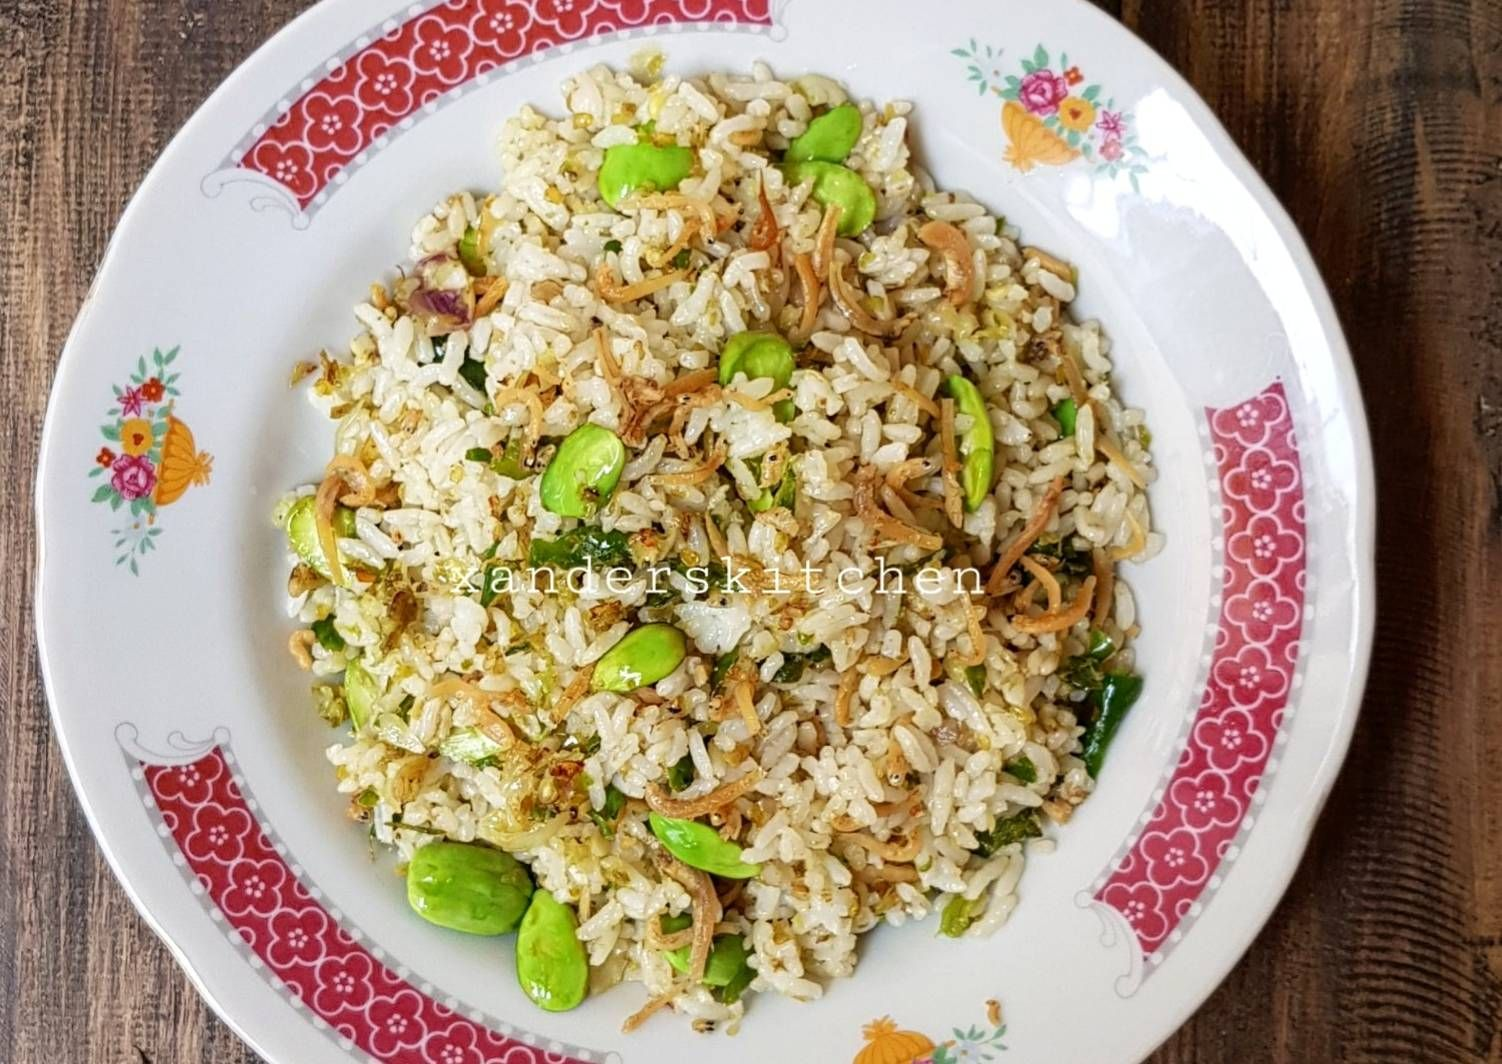 Resep Nasi Goreng Cabe Hijau Oleh Xander S Kitchen Resep Masakan Makanan Masakan Indonesia